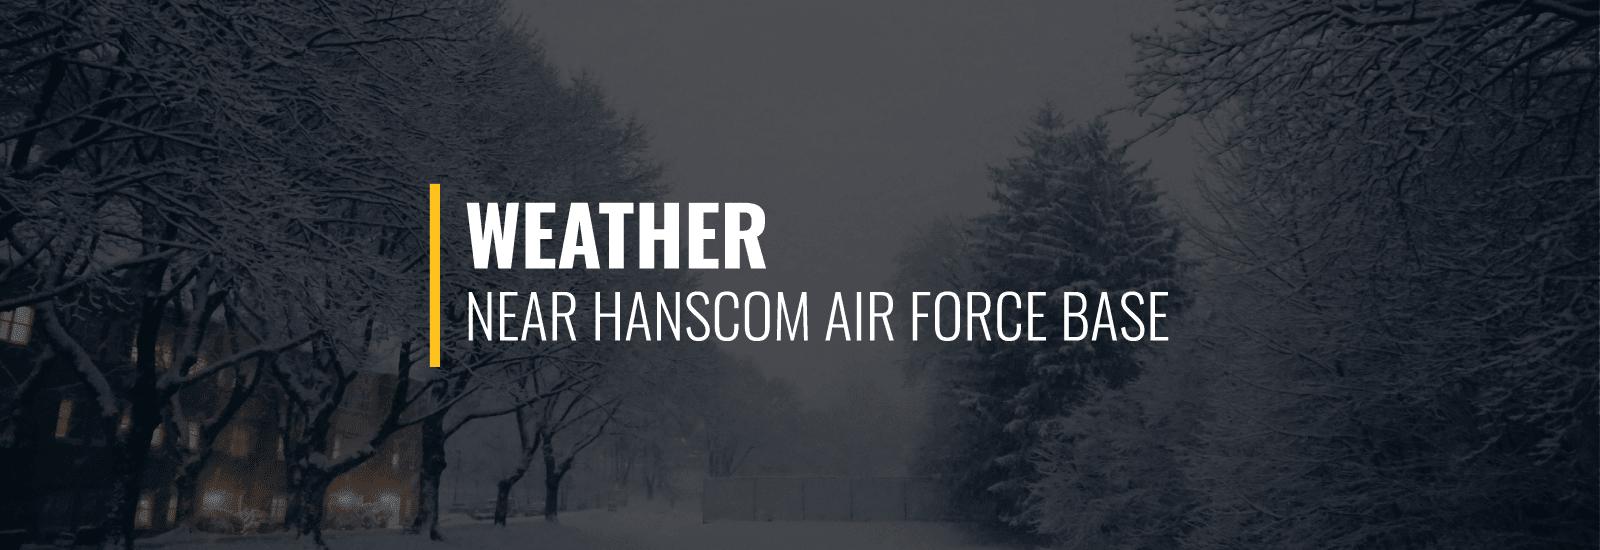 Weather Hanscom AFB